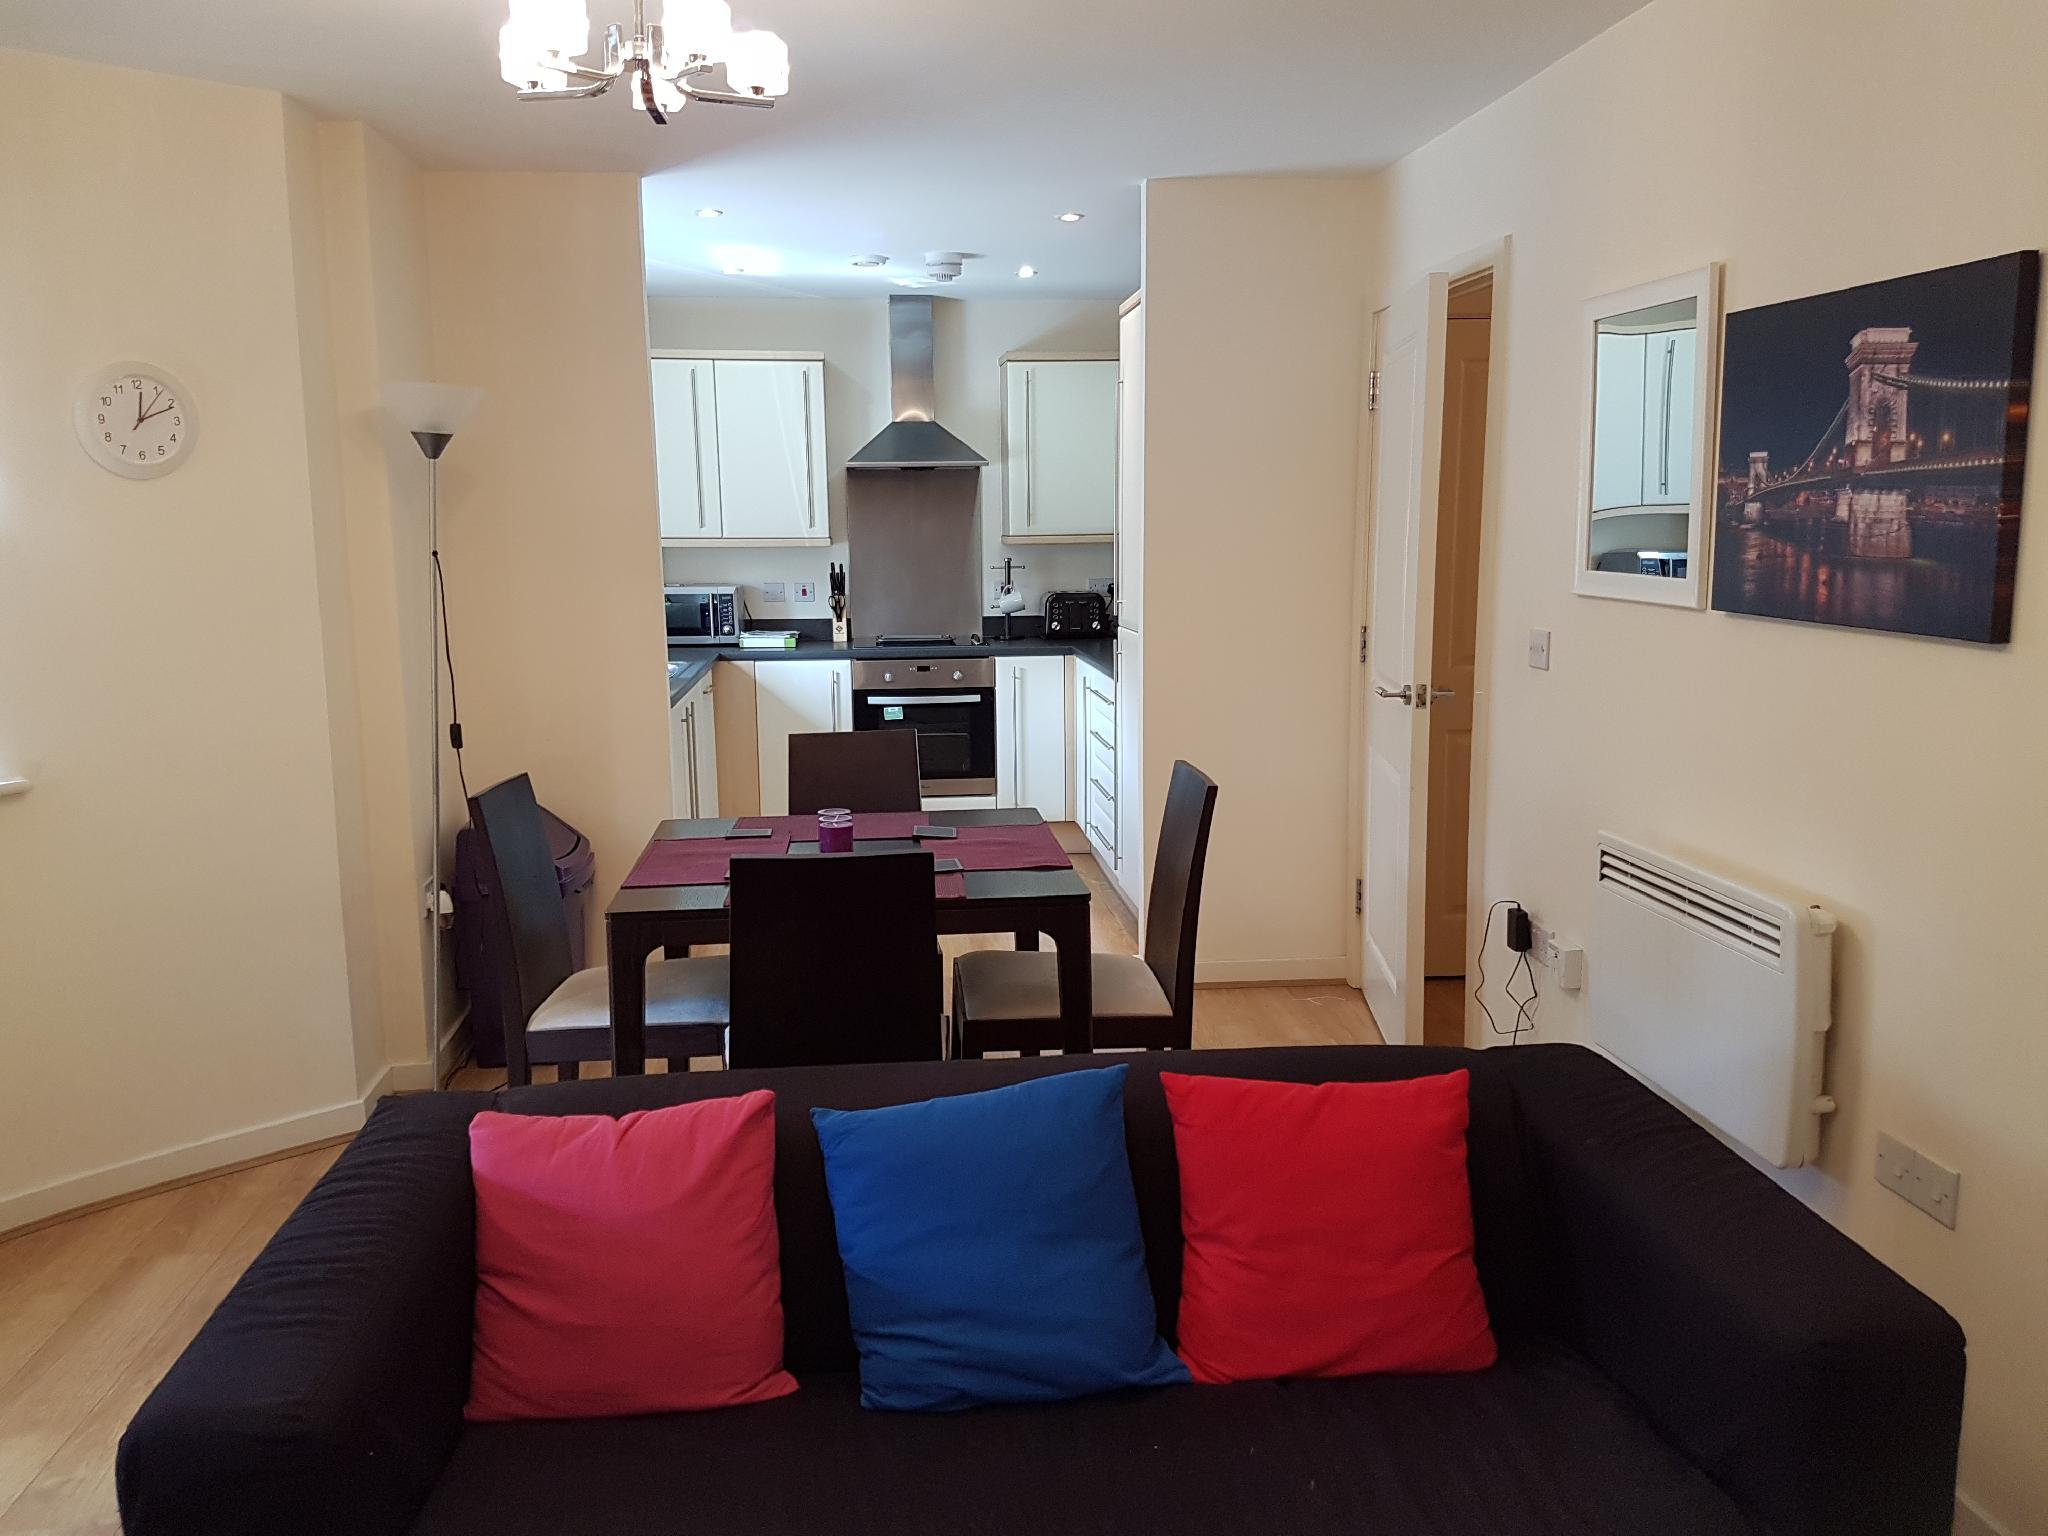 Apartment 2 Bed 2 Bath